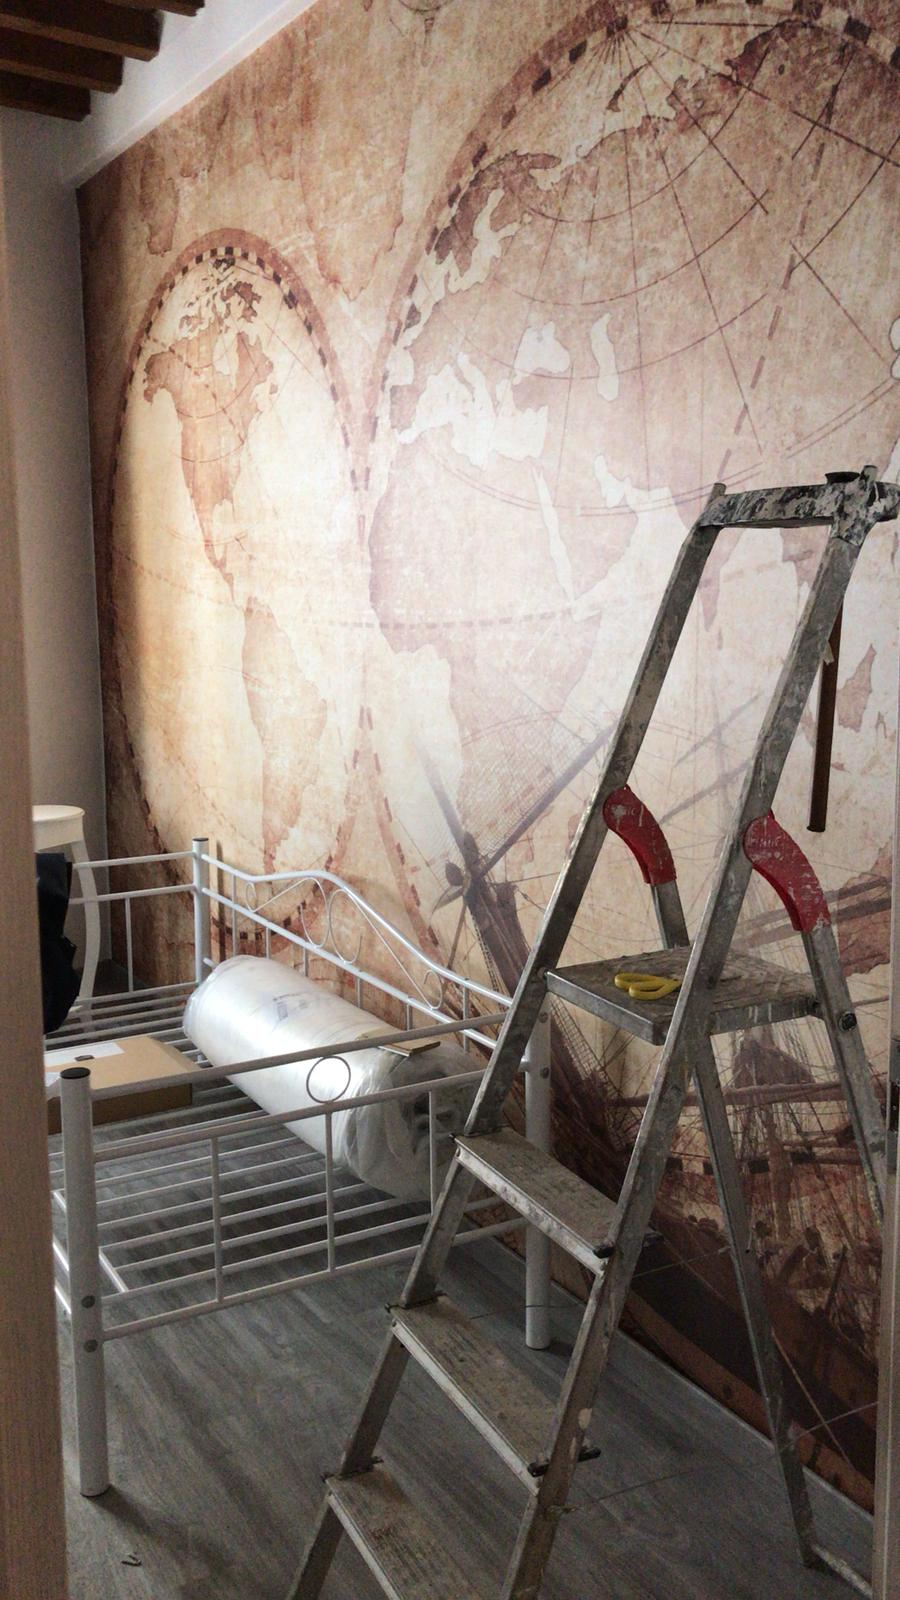 2-tuscan-history-guest-house-rehbuild-news.jpg